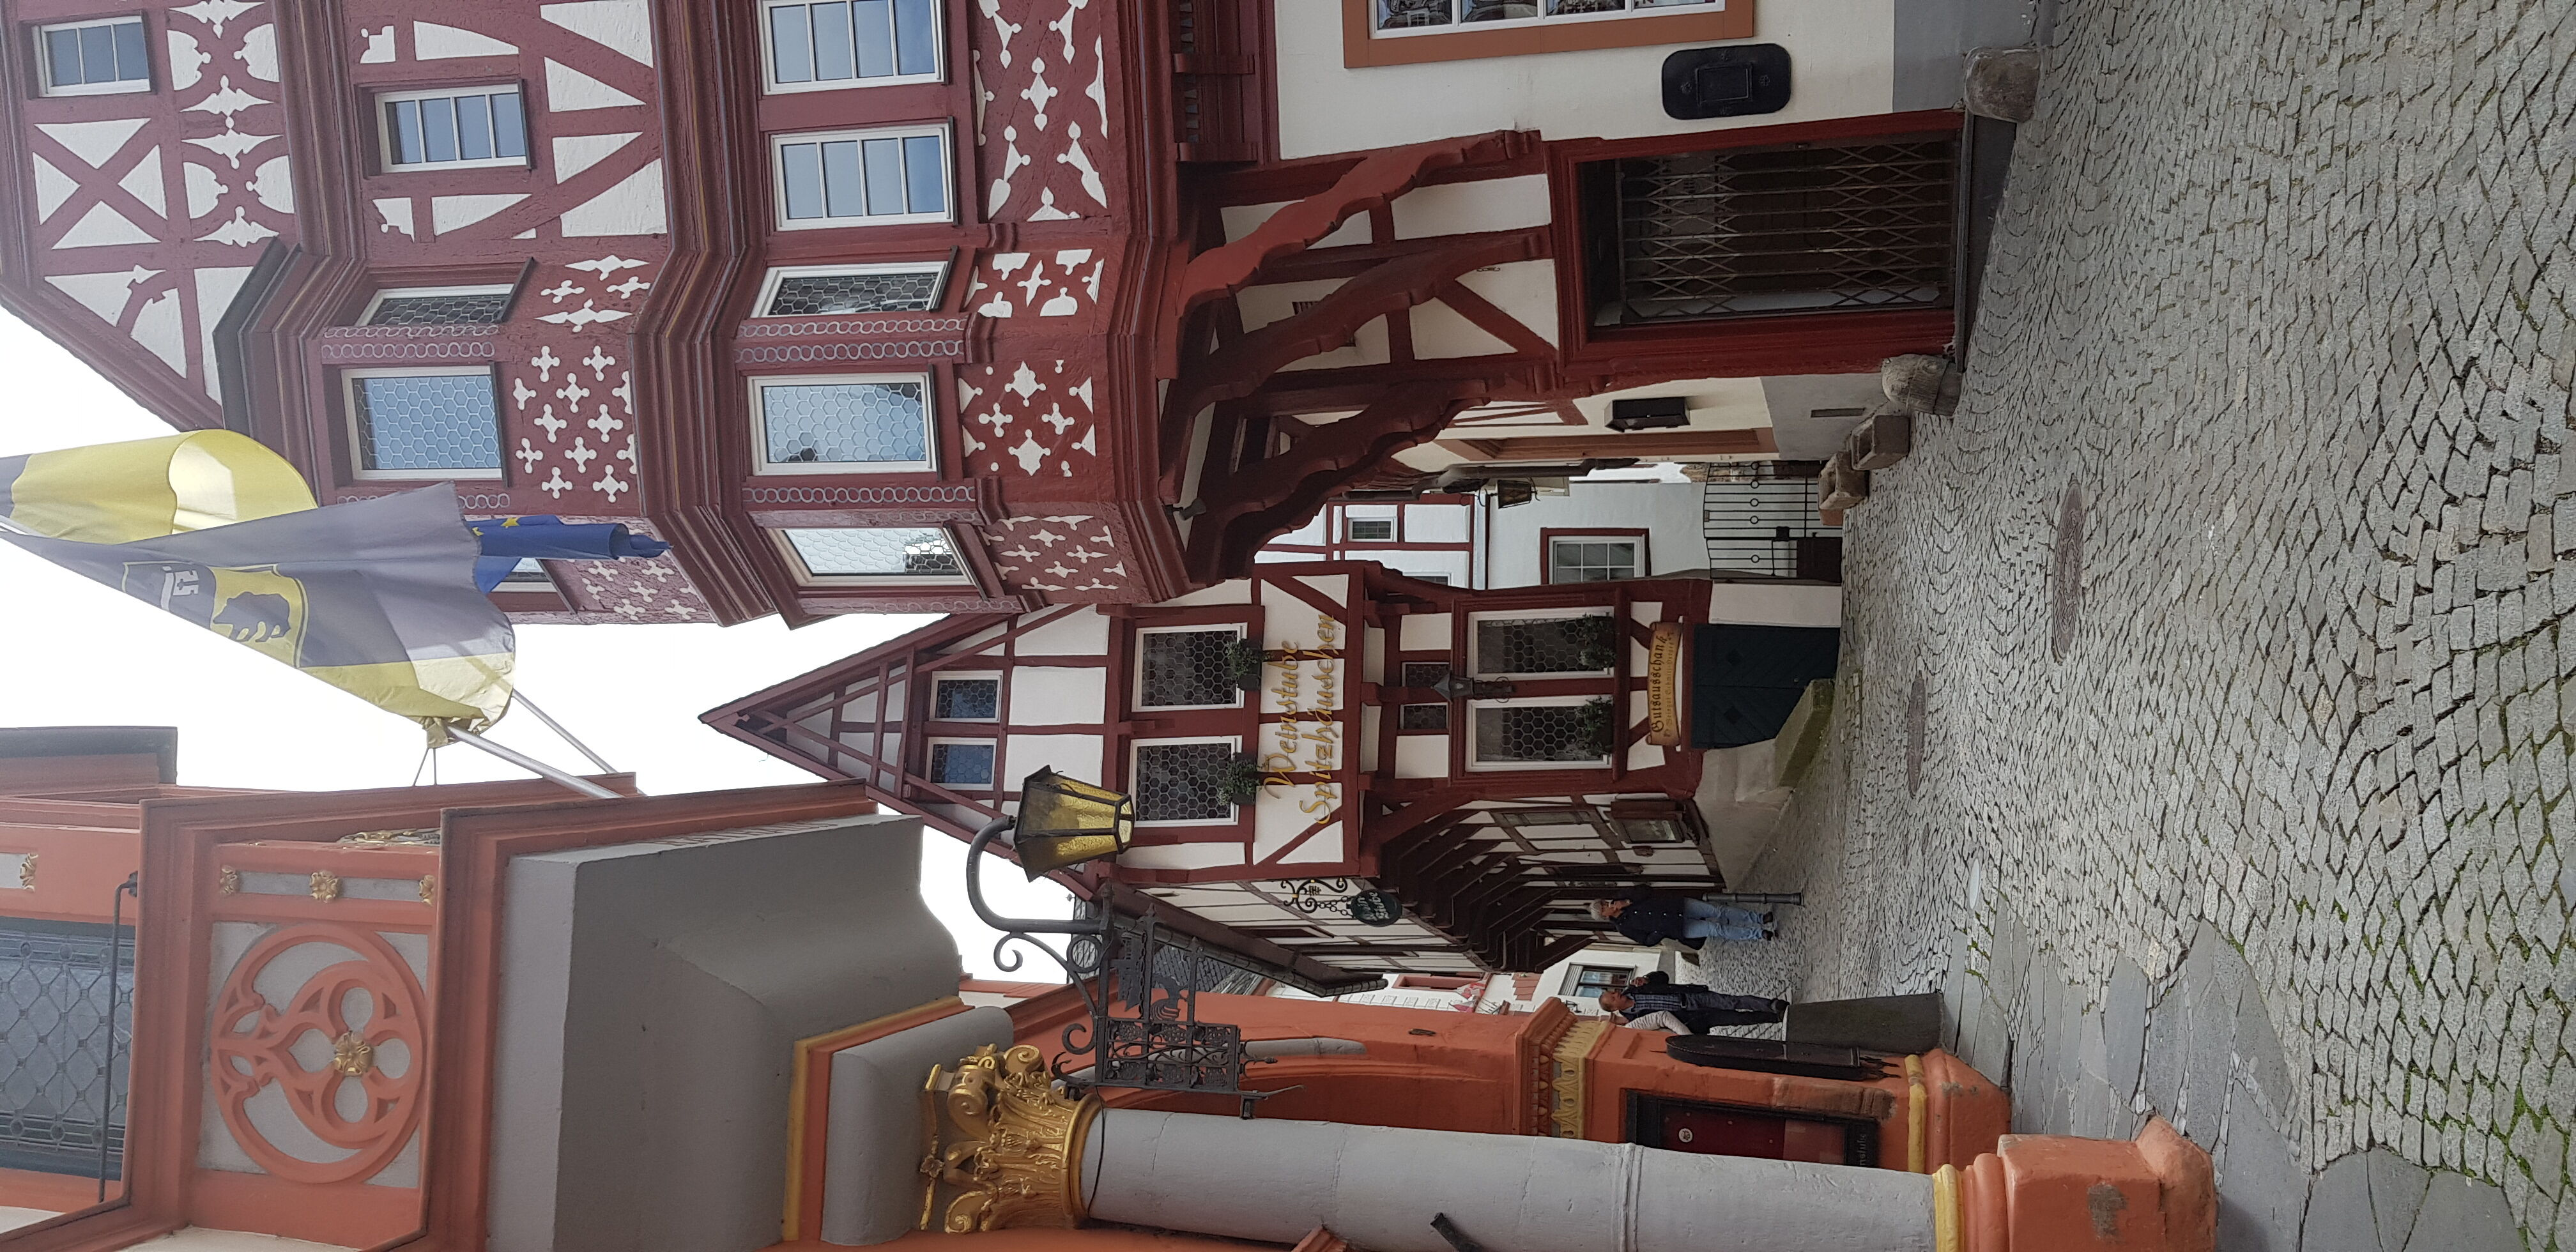 Urlaub an der Mosel im Bernkastel-Kues